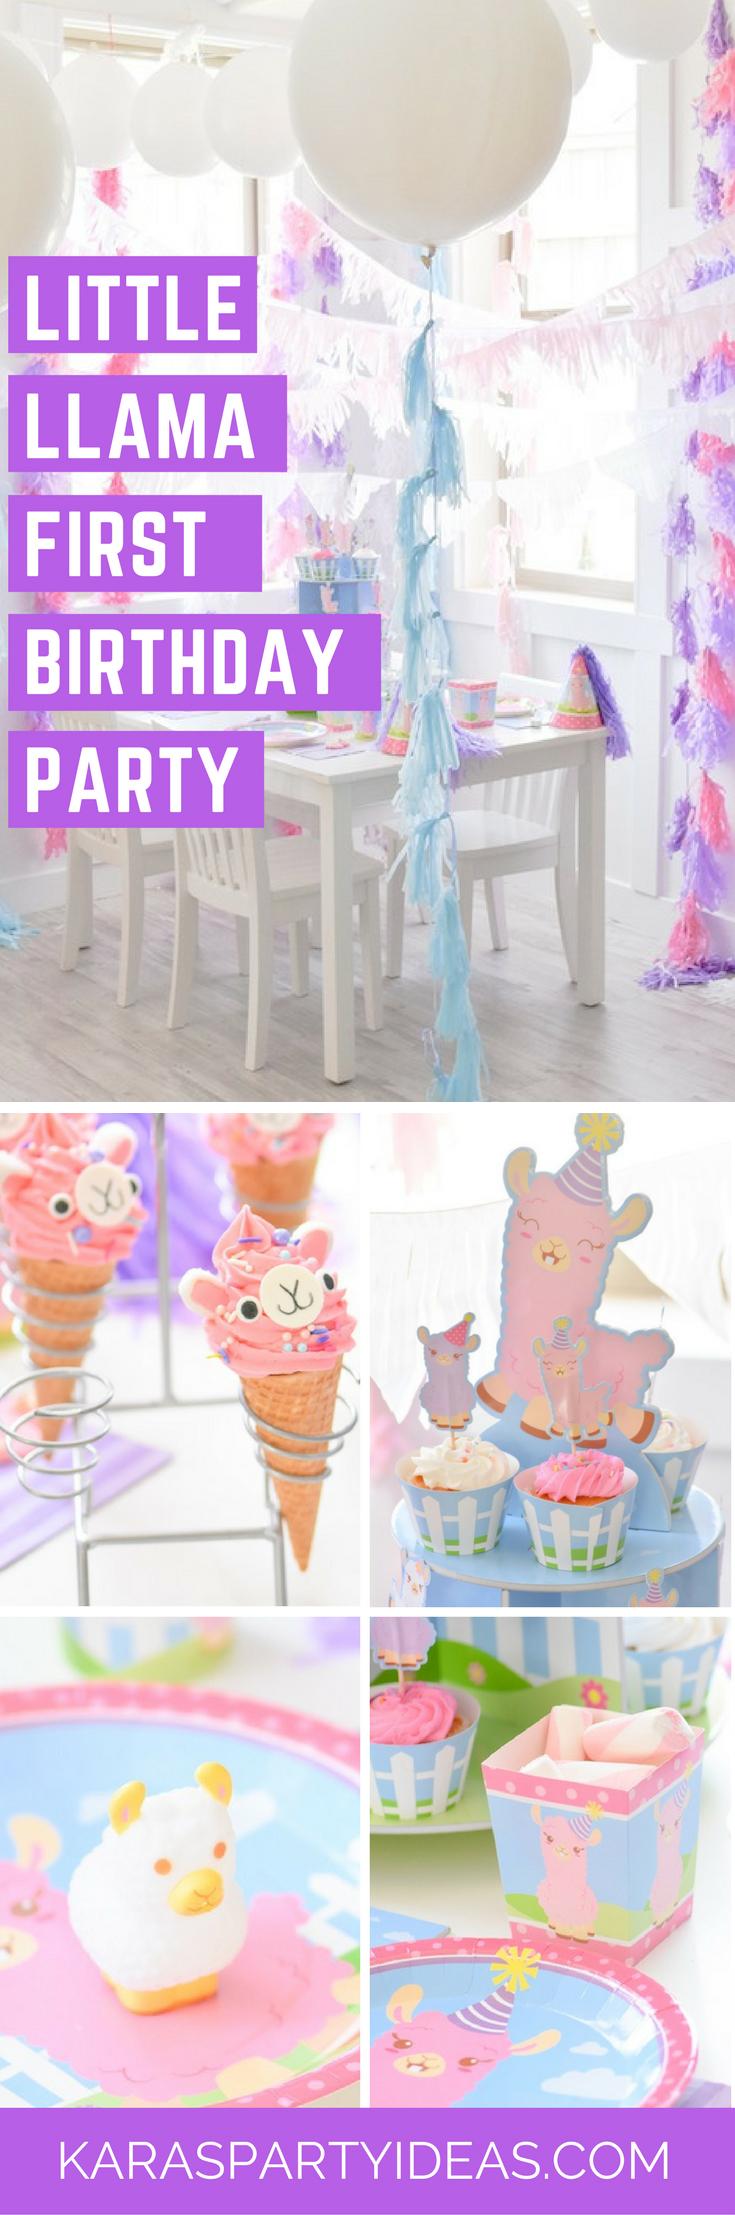 Little Llama First Birthday Party via Kara's Party Ideas - KarasPartyIdeas.com